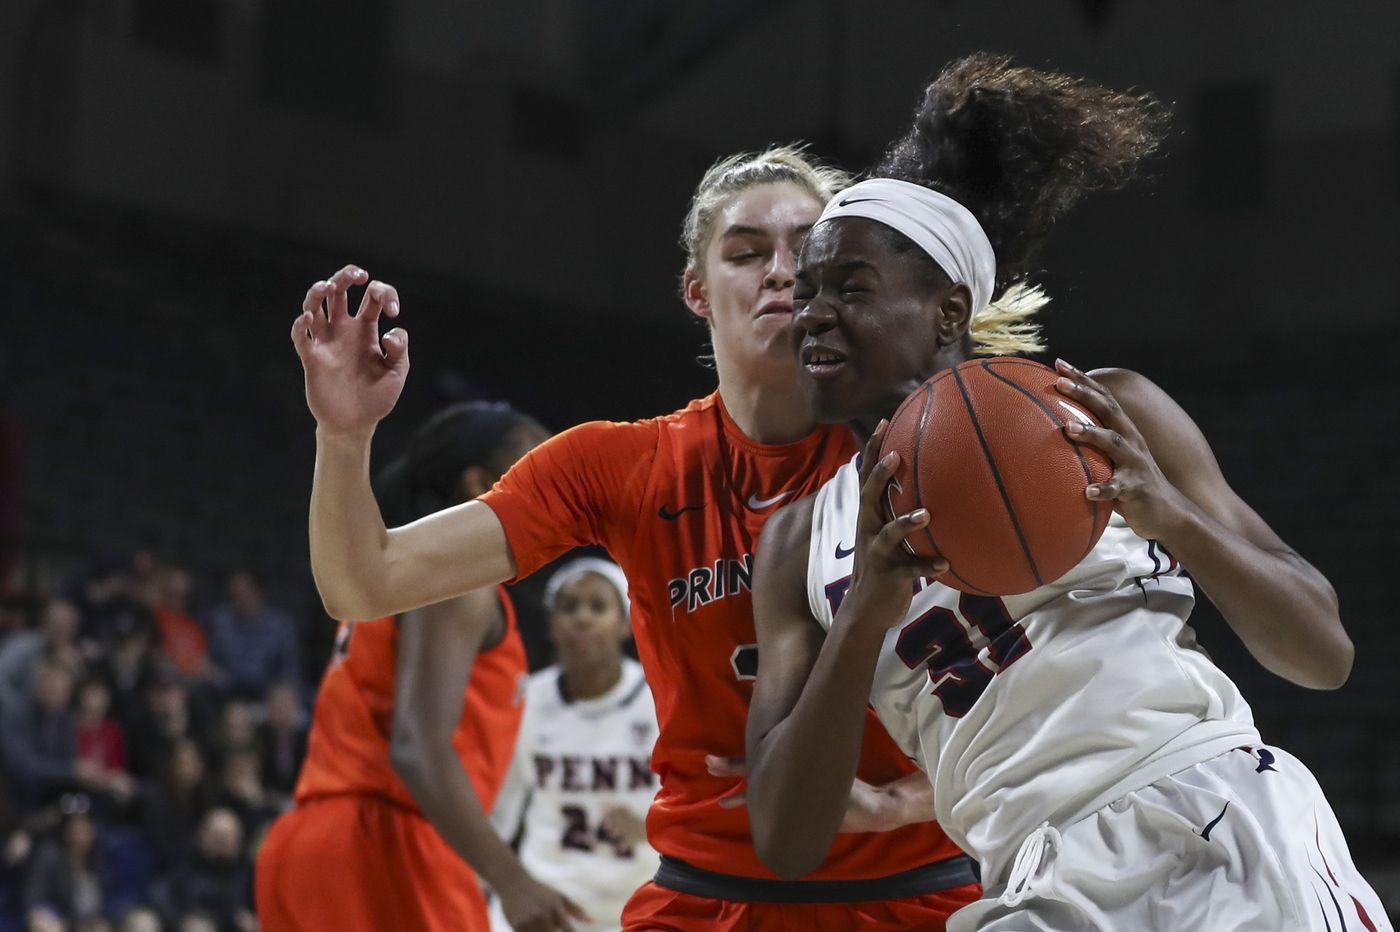 Women's City Six: Senior leaders keeping Drexel hungry; defensive change sparking Penn's winning streak